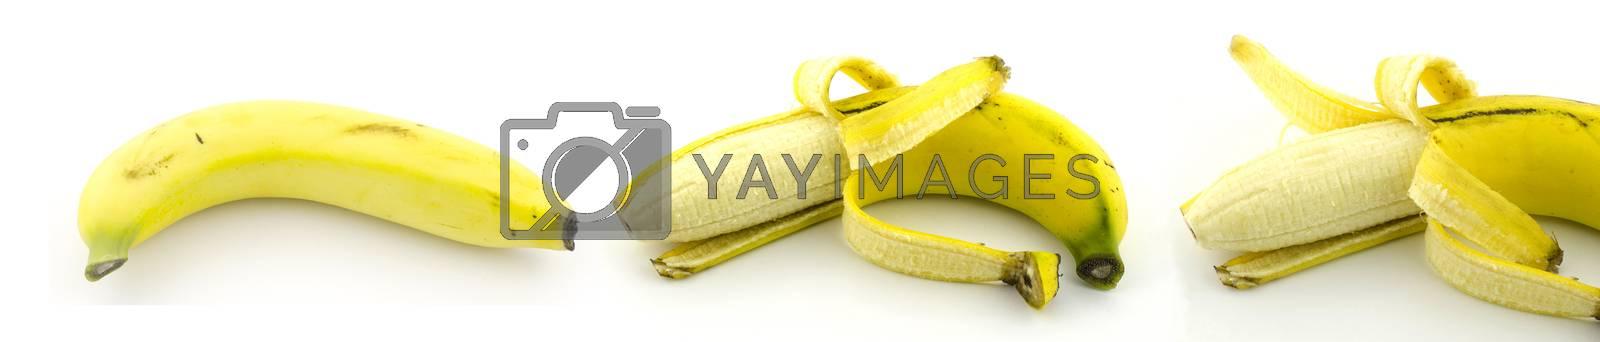 three banana isolate with white background